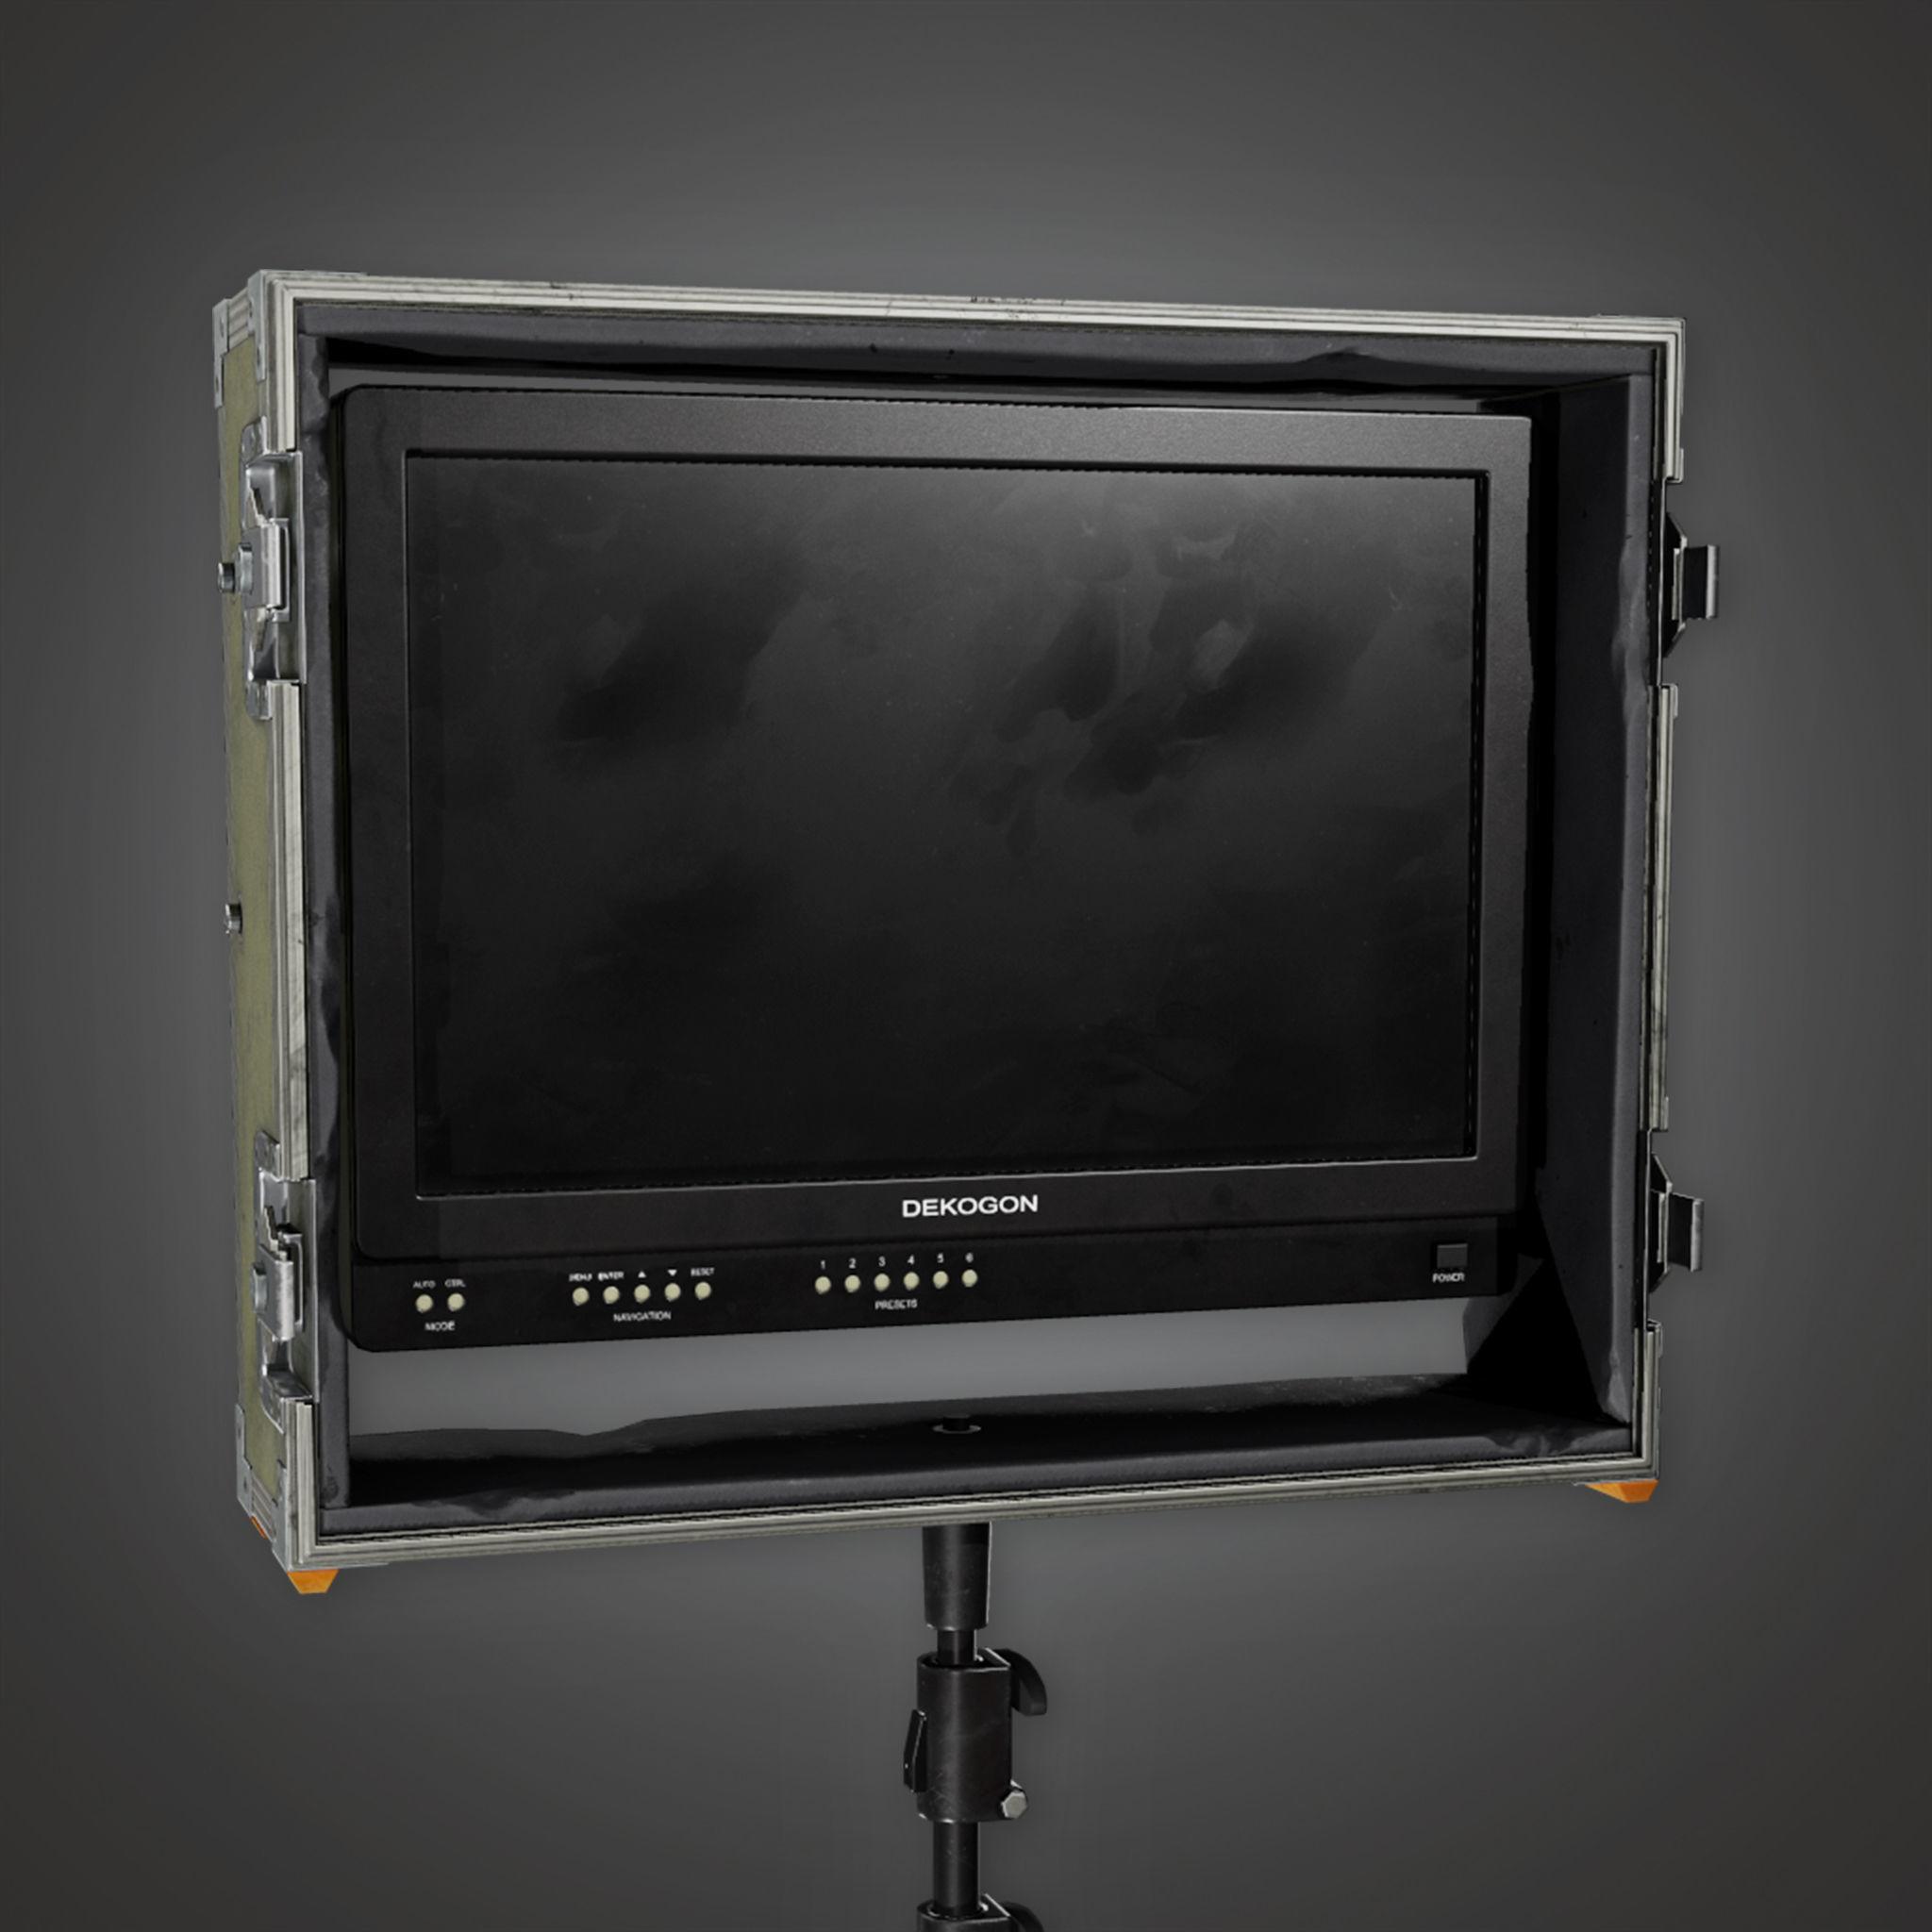 HLW - Display Monitor 01 - PBR Game Ready